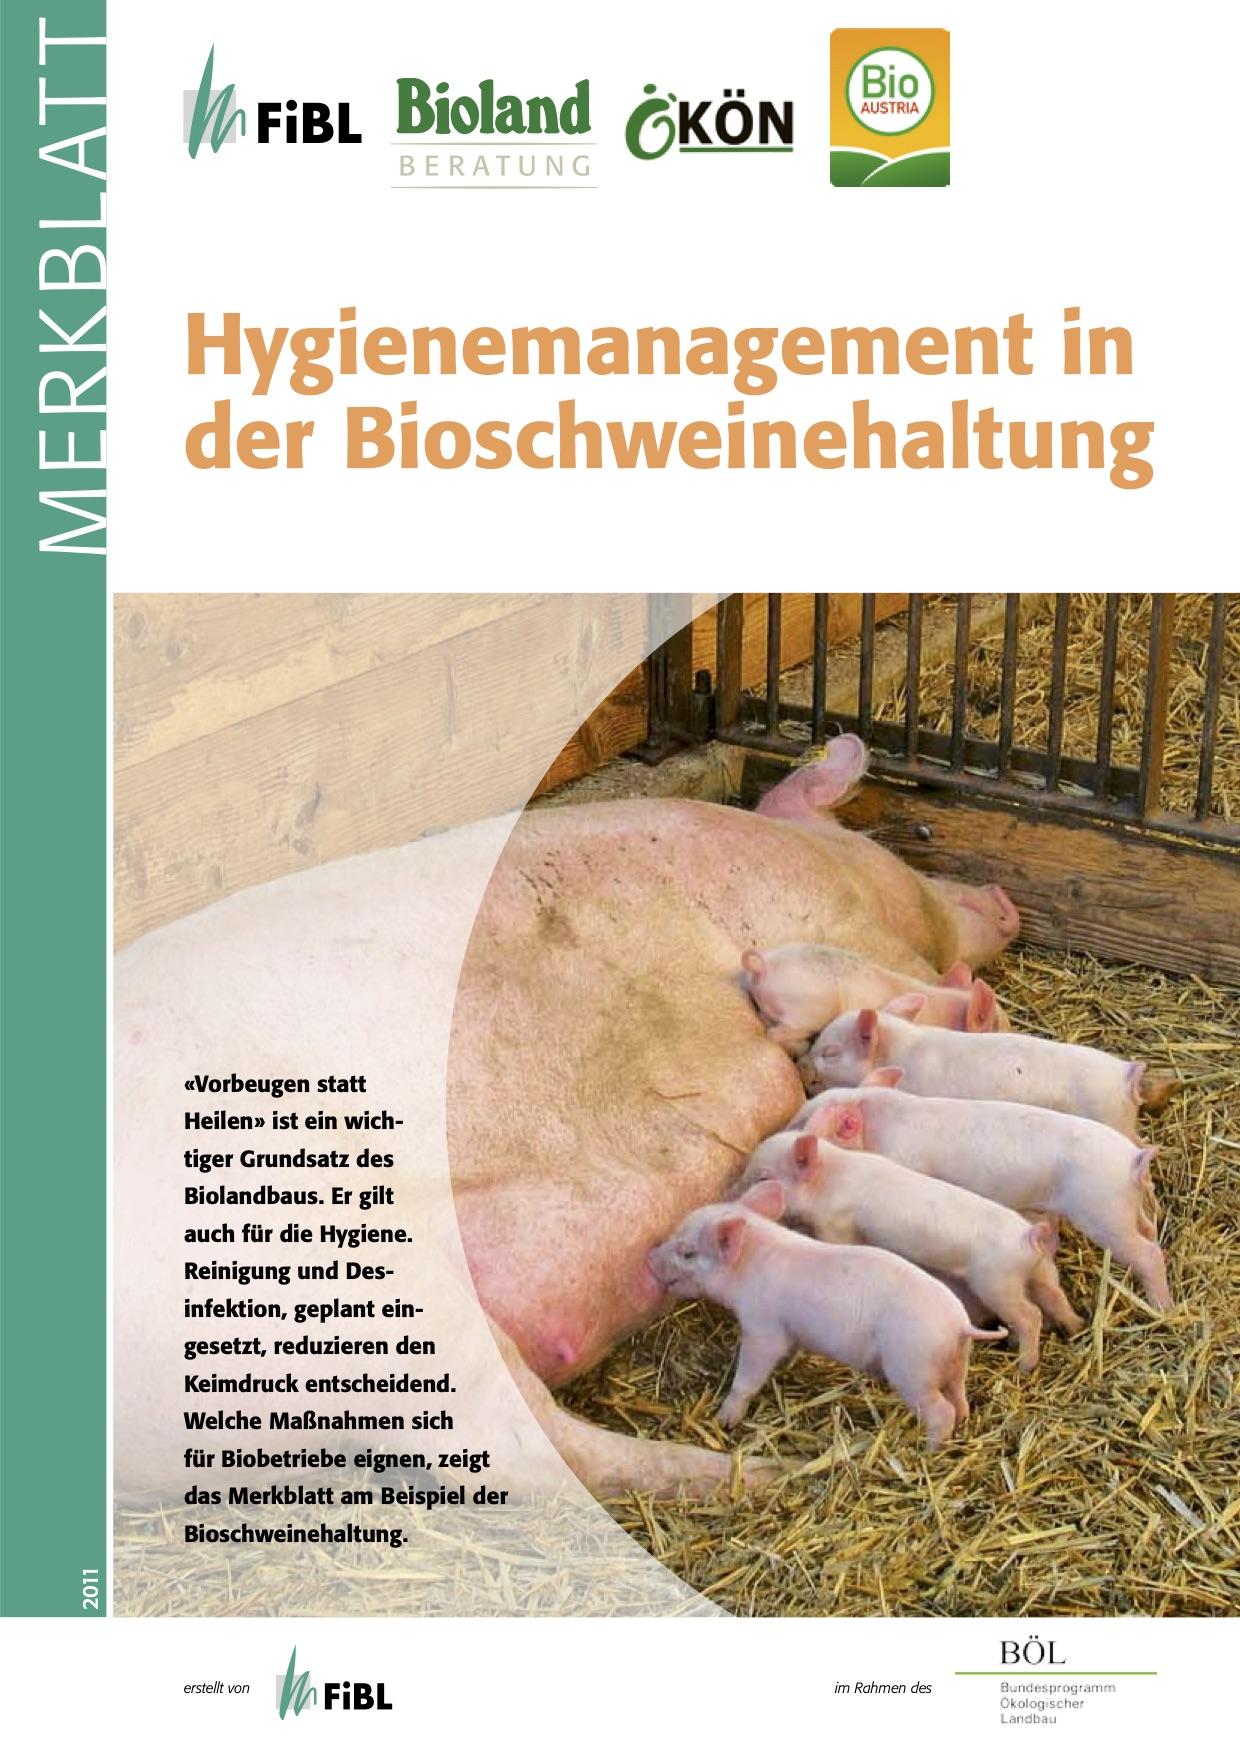 Hygiene management in organic pig husbandry